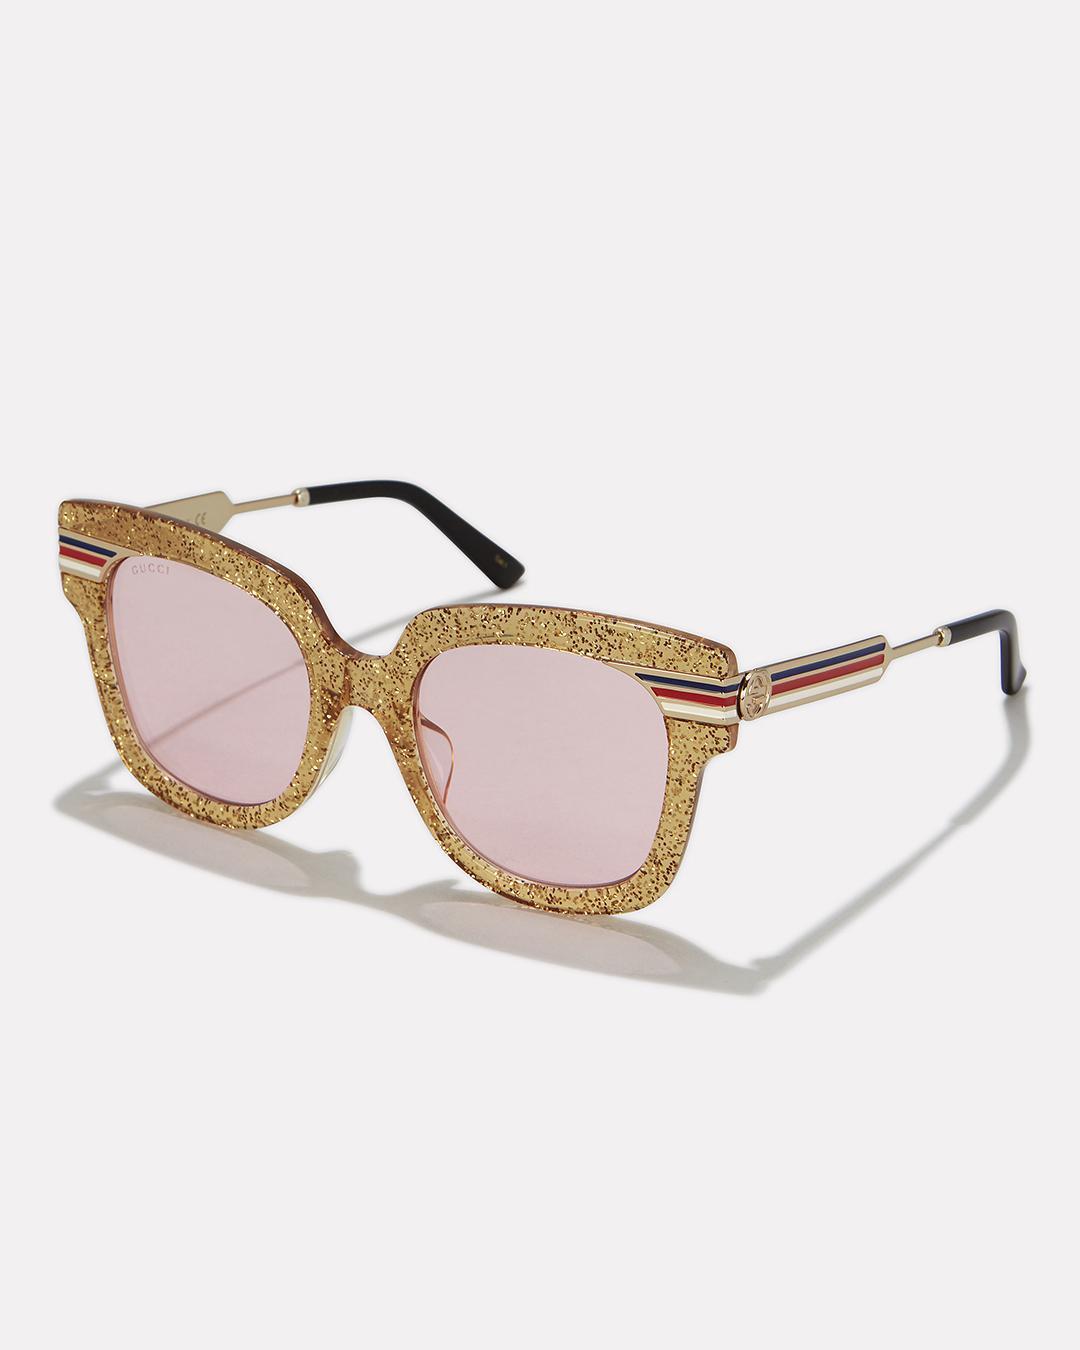 72c83b6bf3 Gucci Gold Glitter Pink Lens Sunglasses in Metallic - Lyst